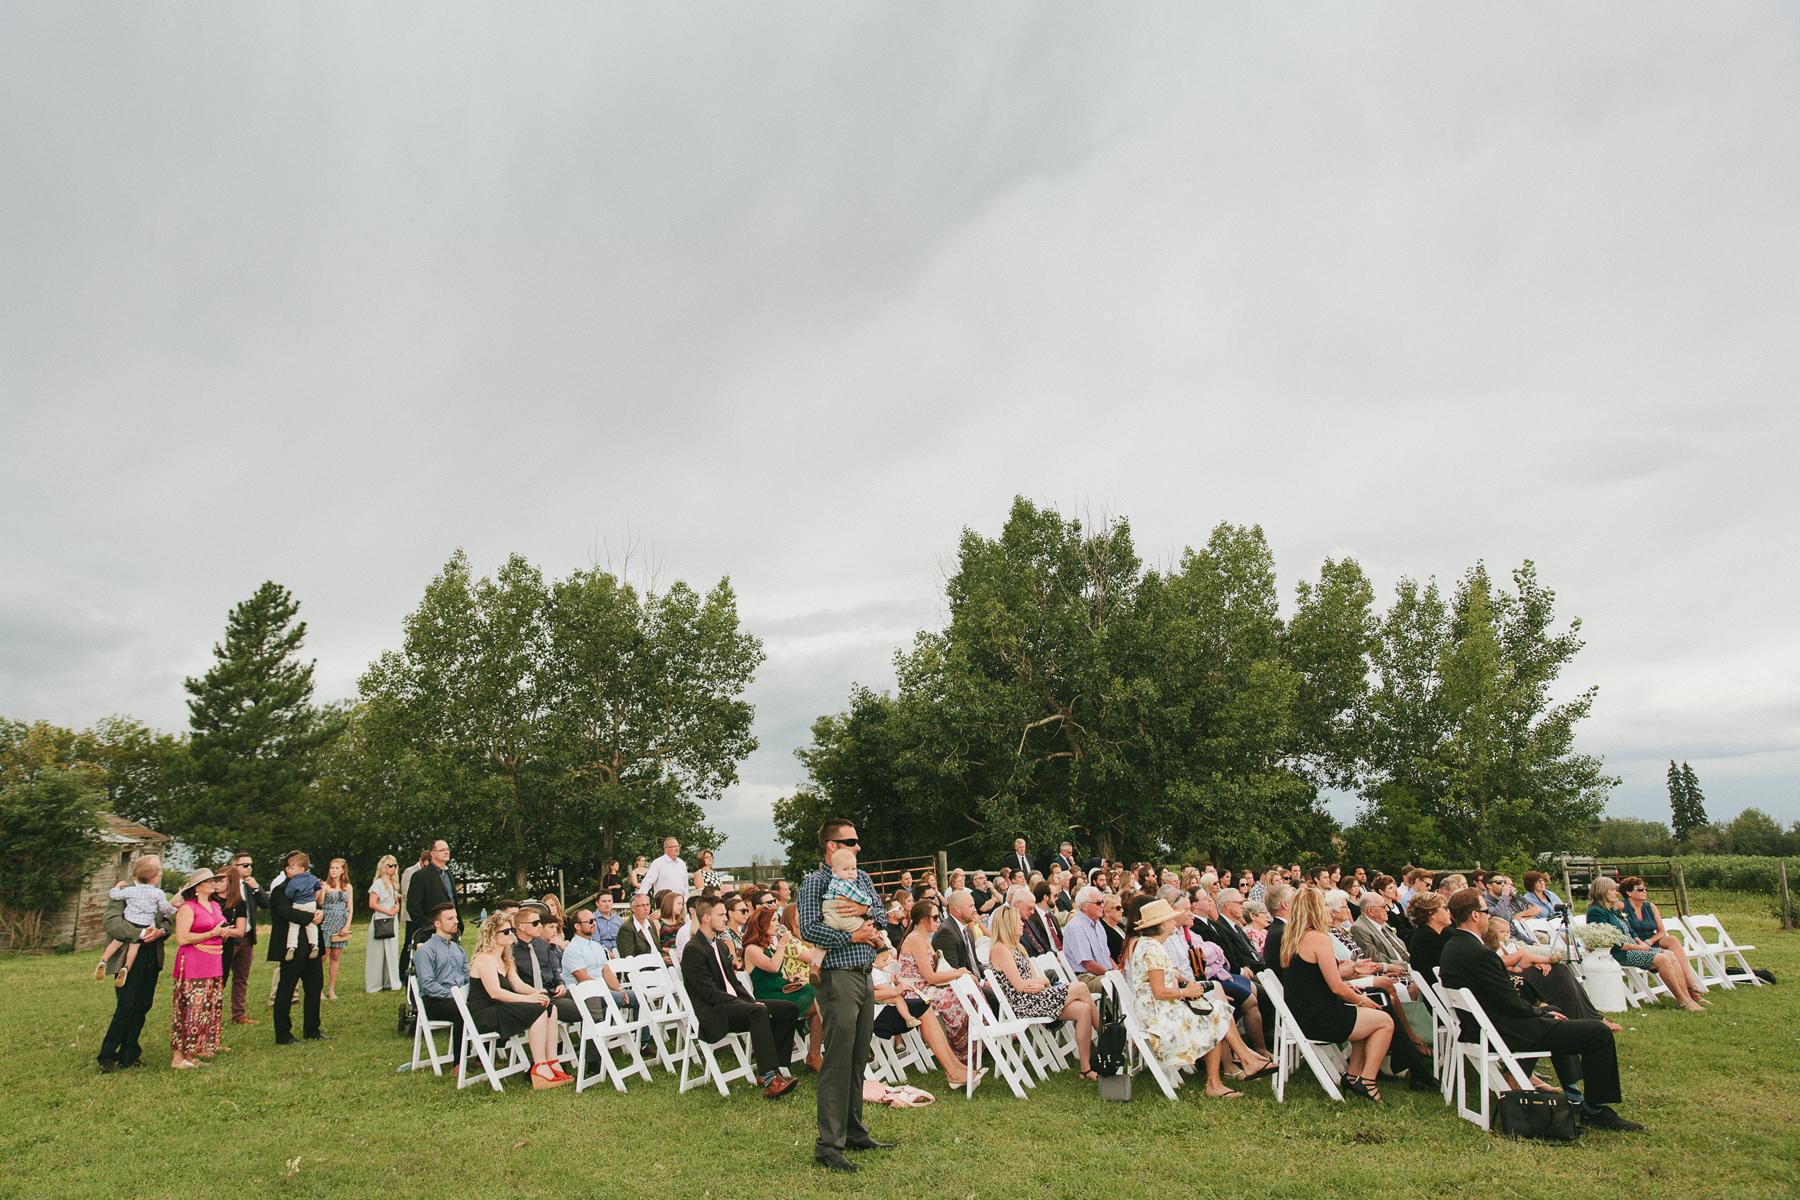 alberta-farm-wedding-photographer-rp-wj-134.jpg